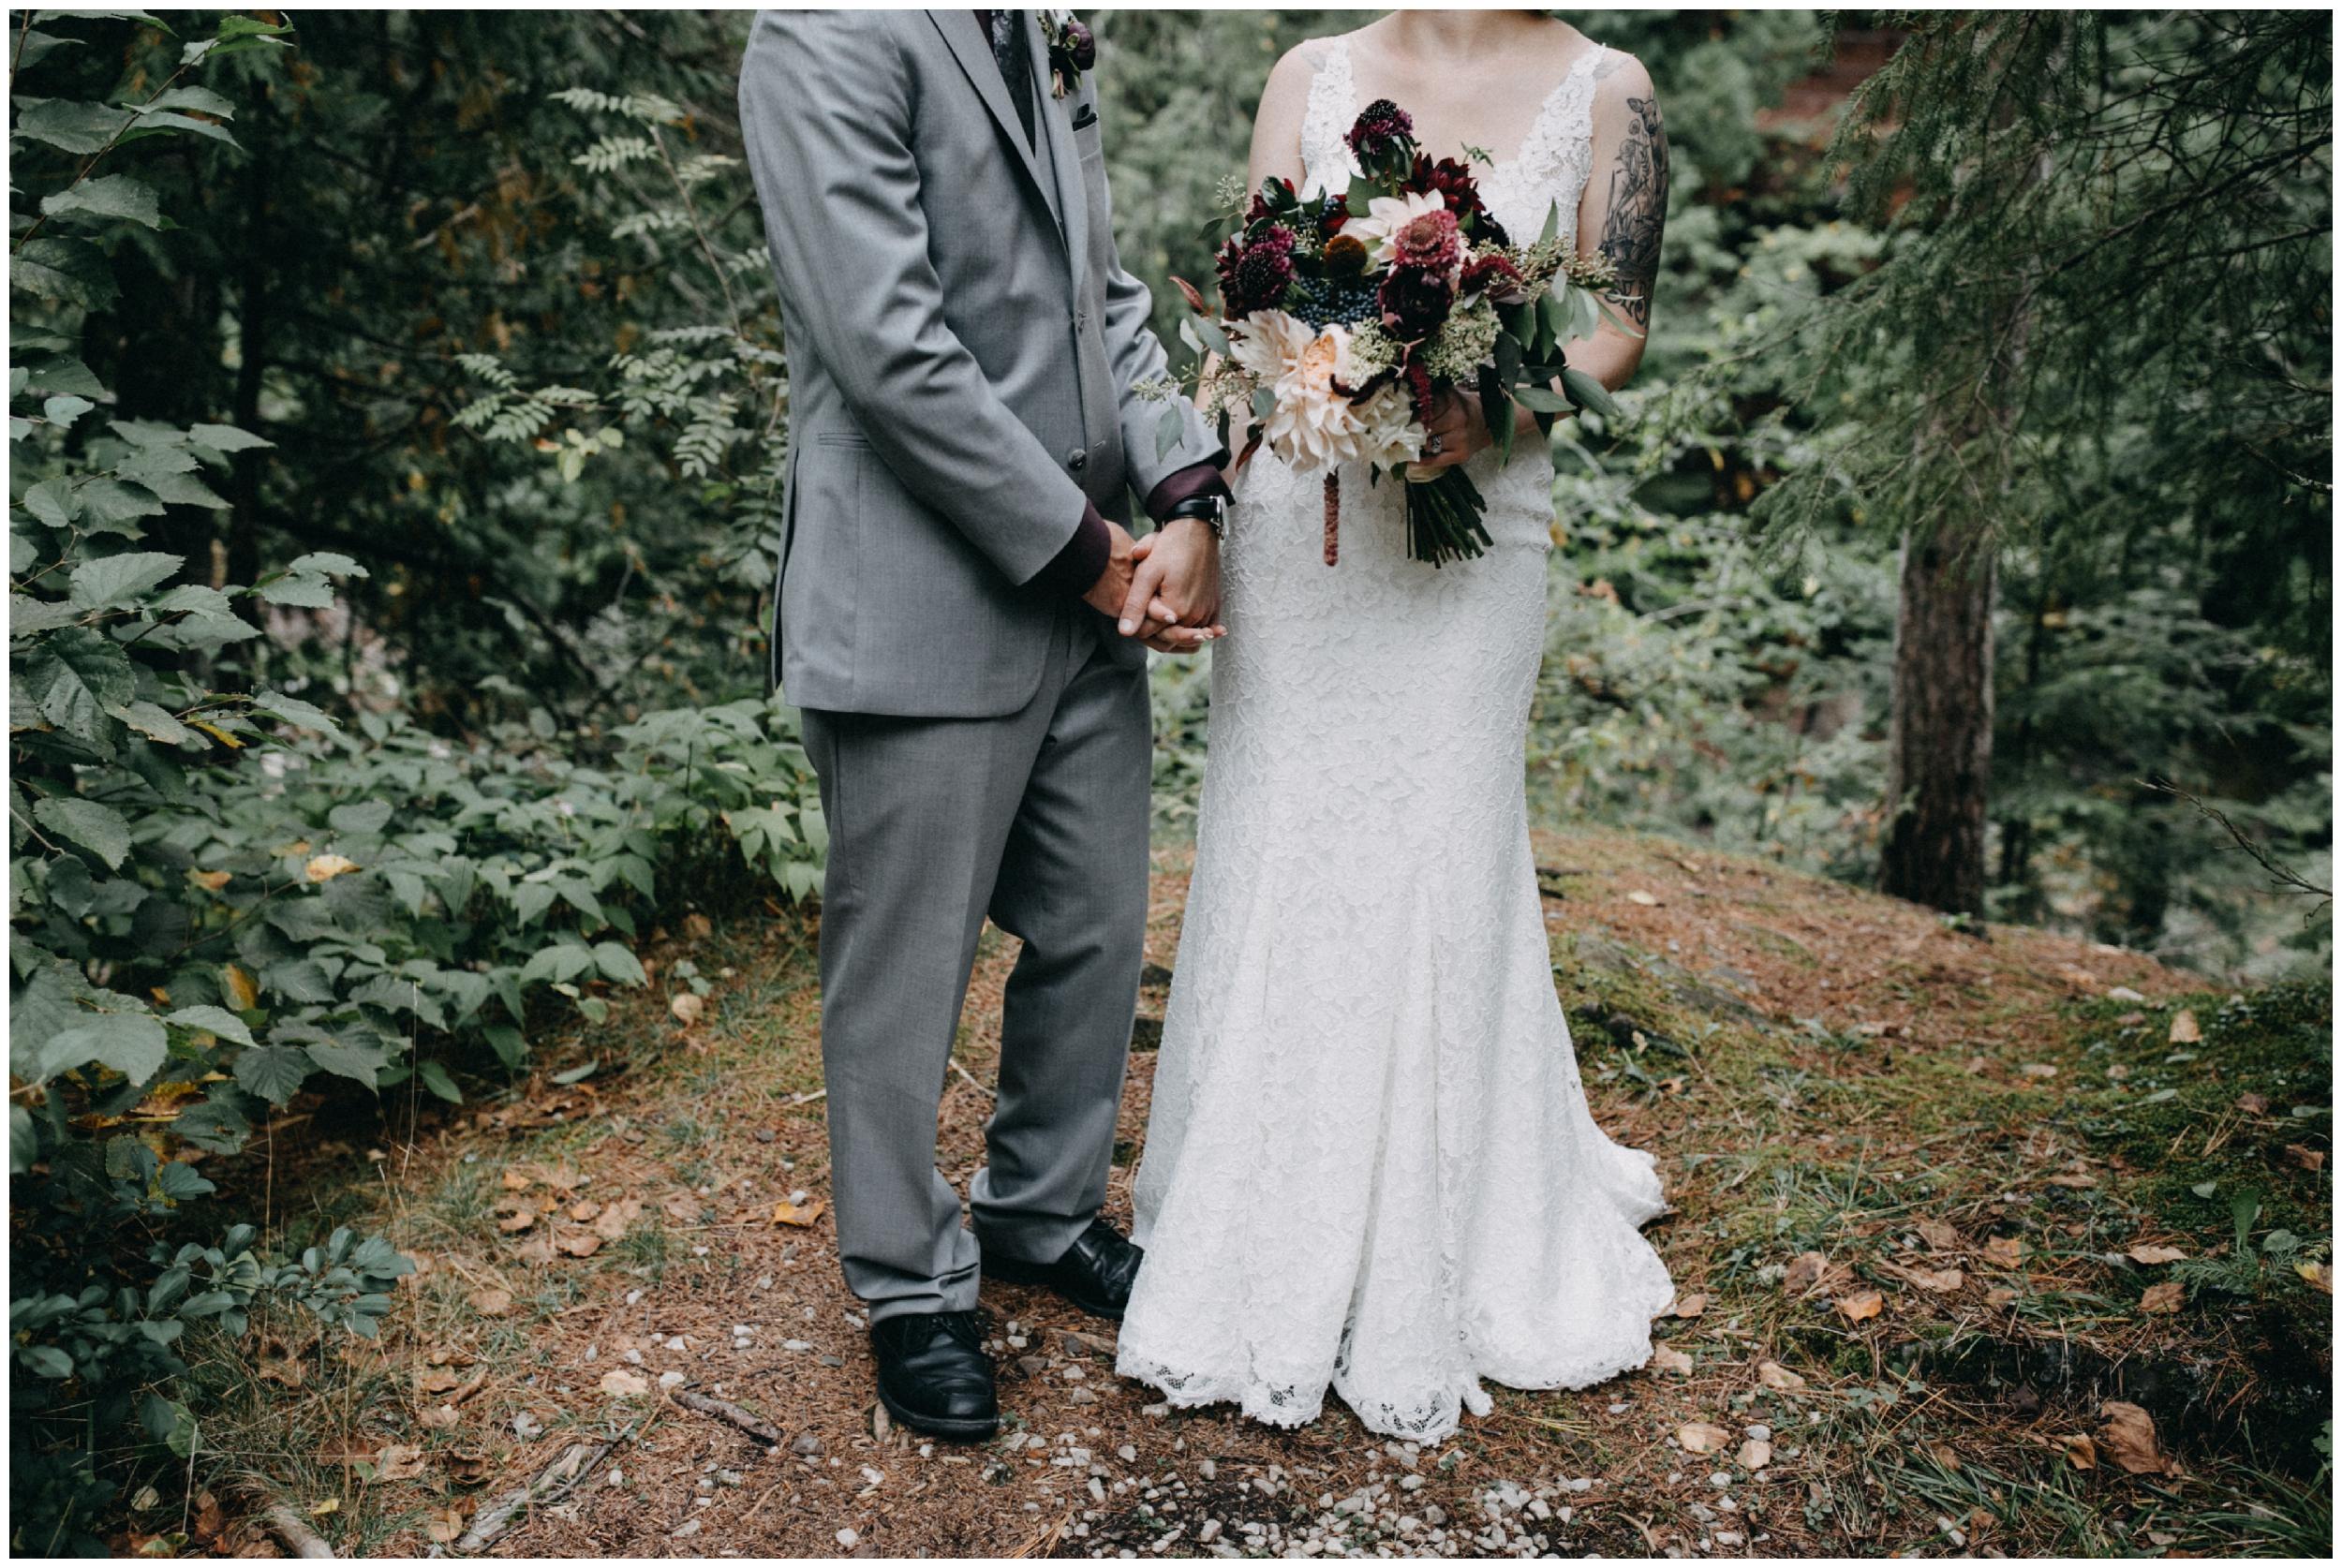 Duluth wedding ceremony in the woods photographed by Britt DeZeeuw